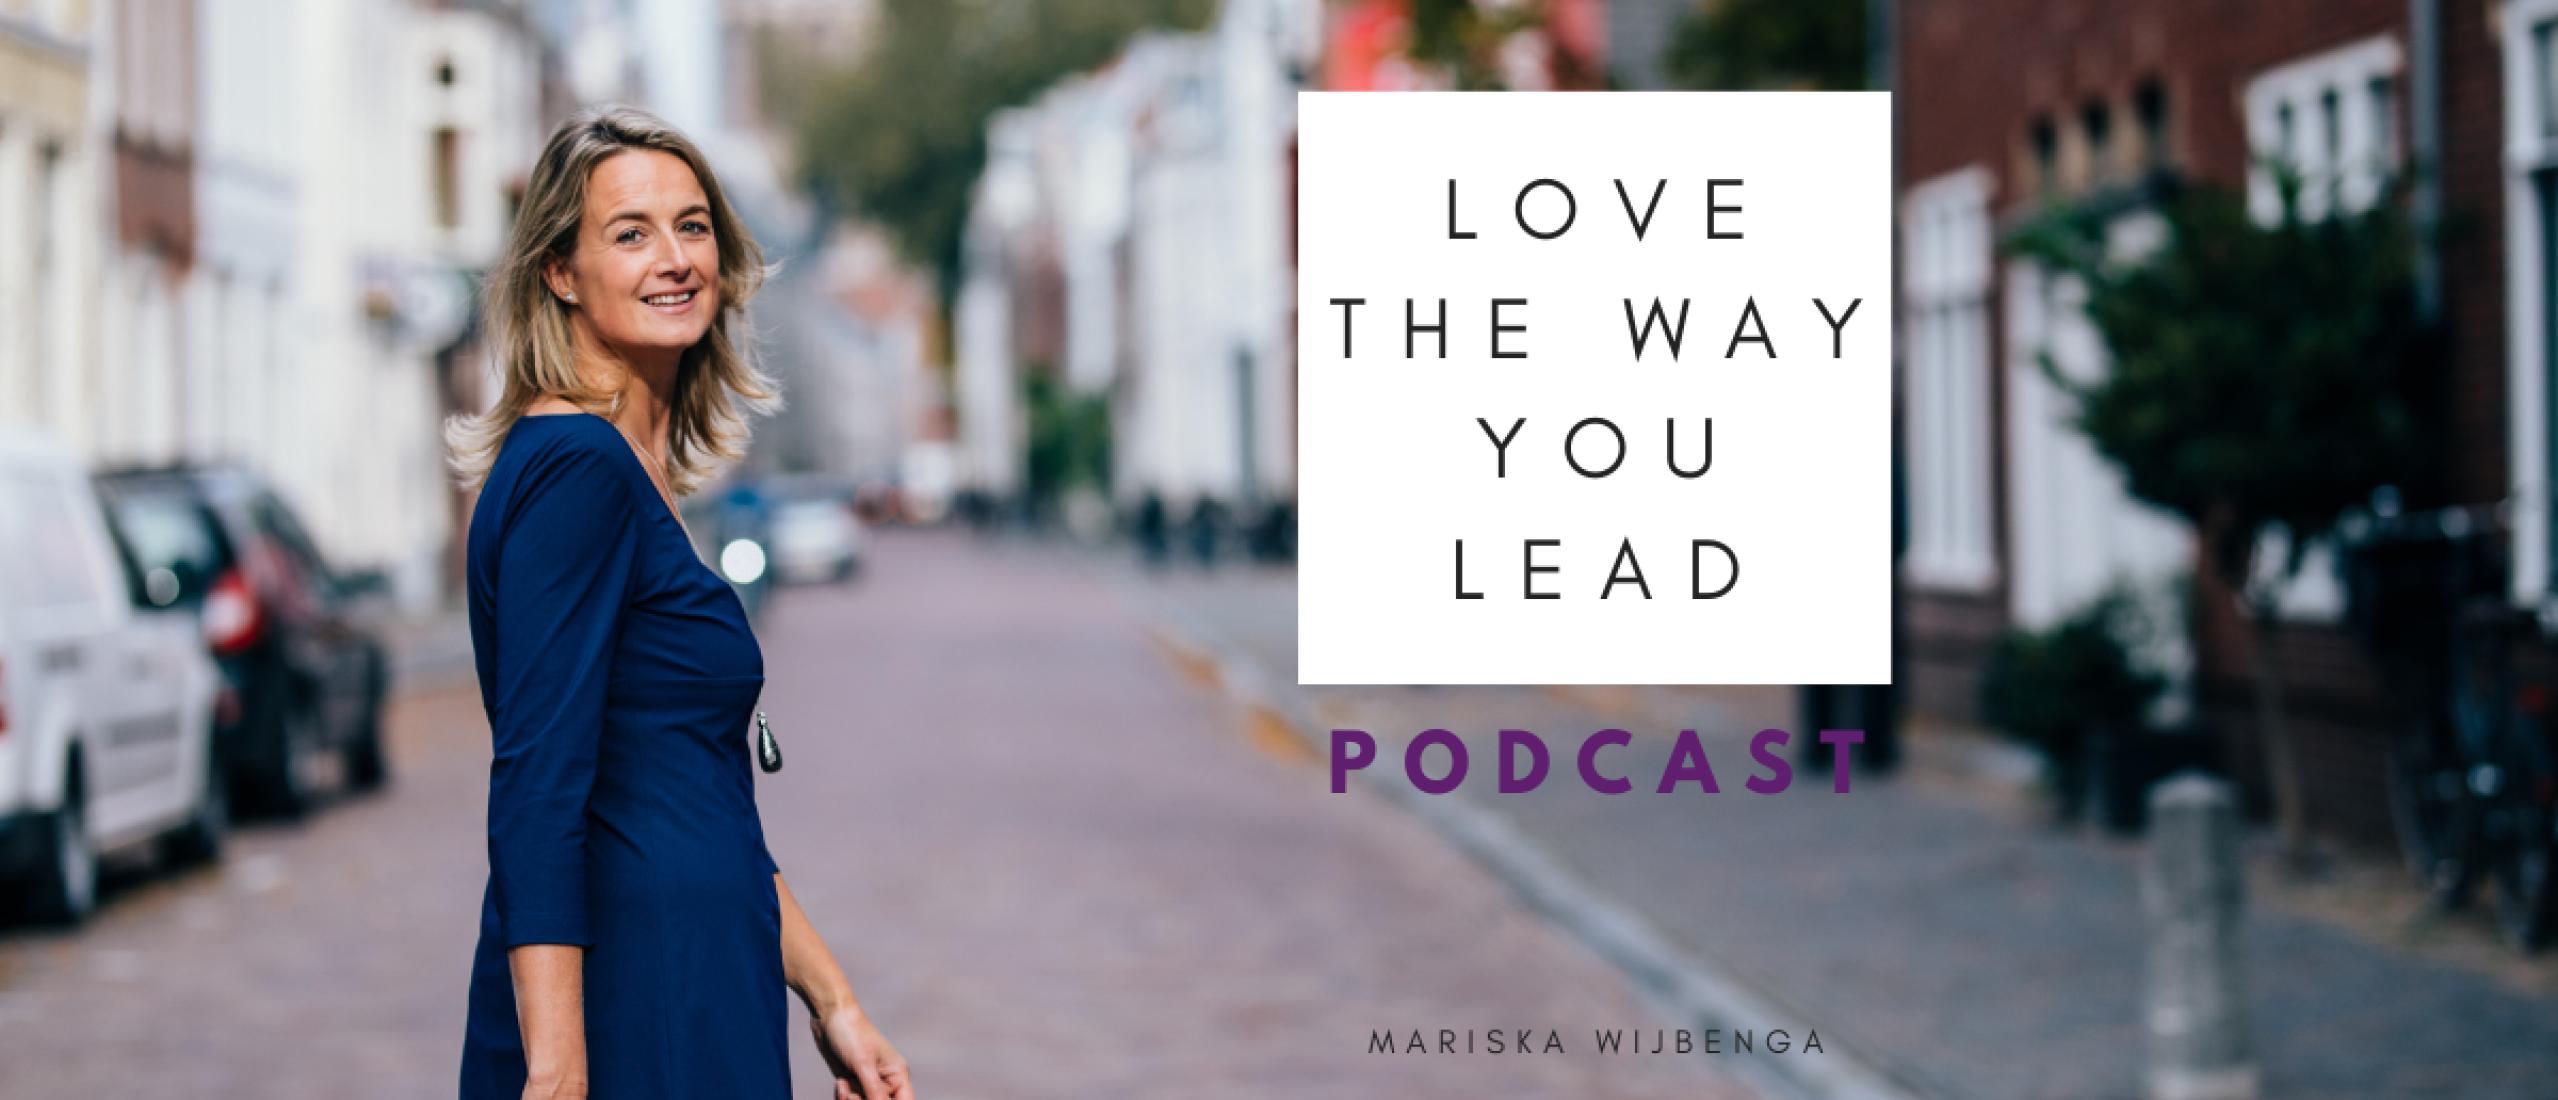 Love The Way You Lead-podcast Mariska Wijbenga